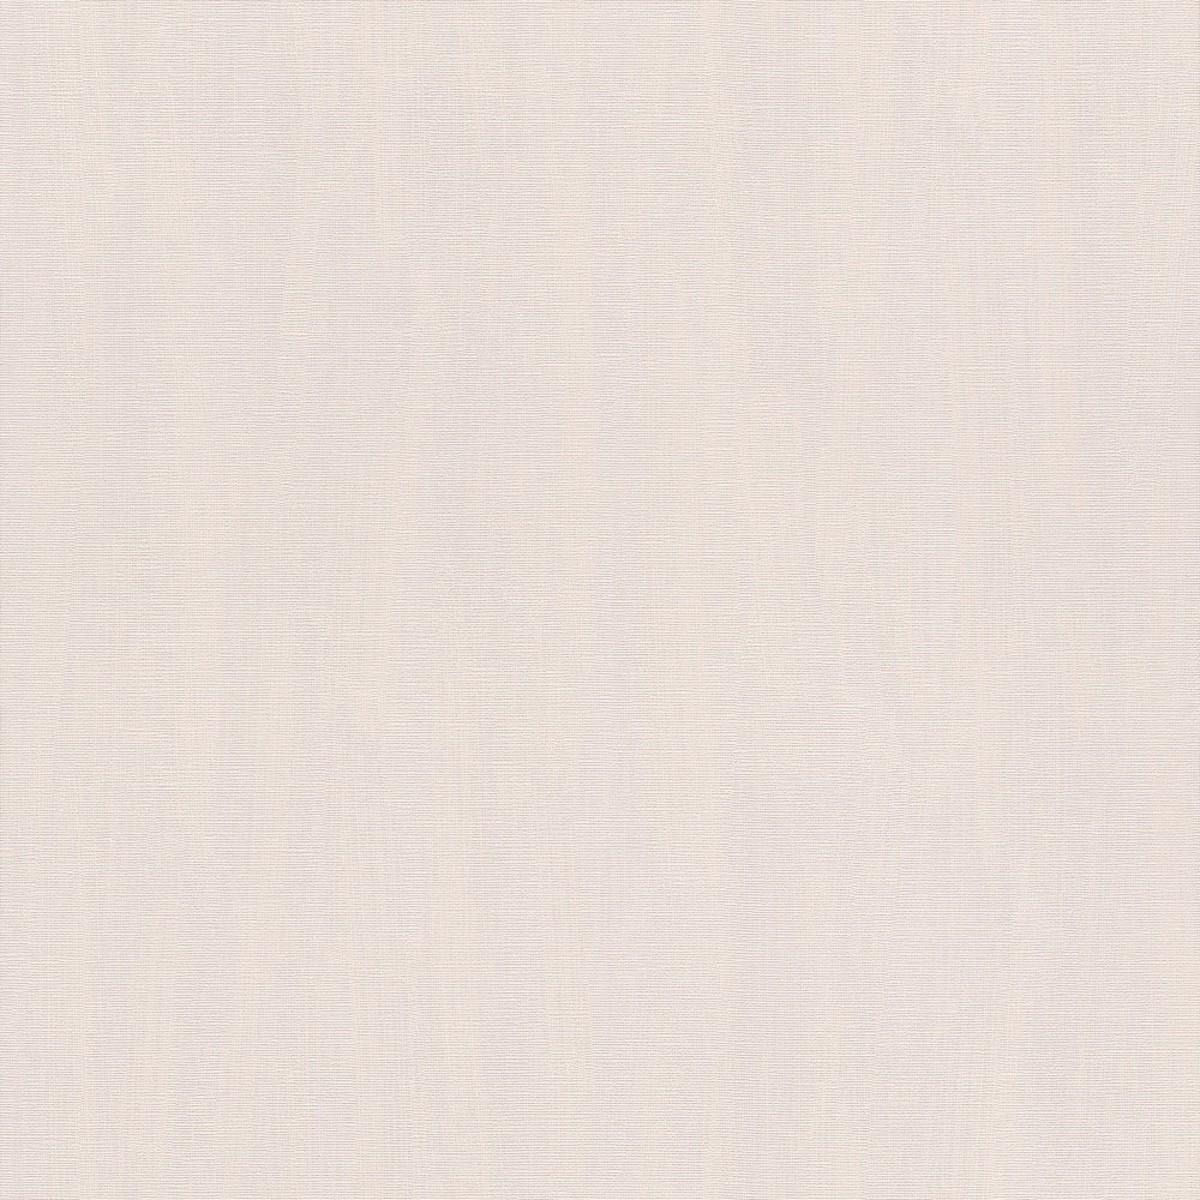 Обои флизелиновые Rasch Hyde Park розовые 0.53 м 411843